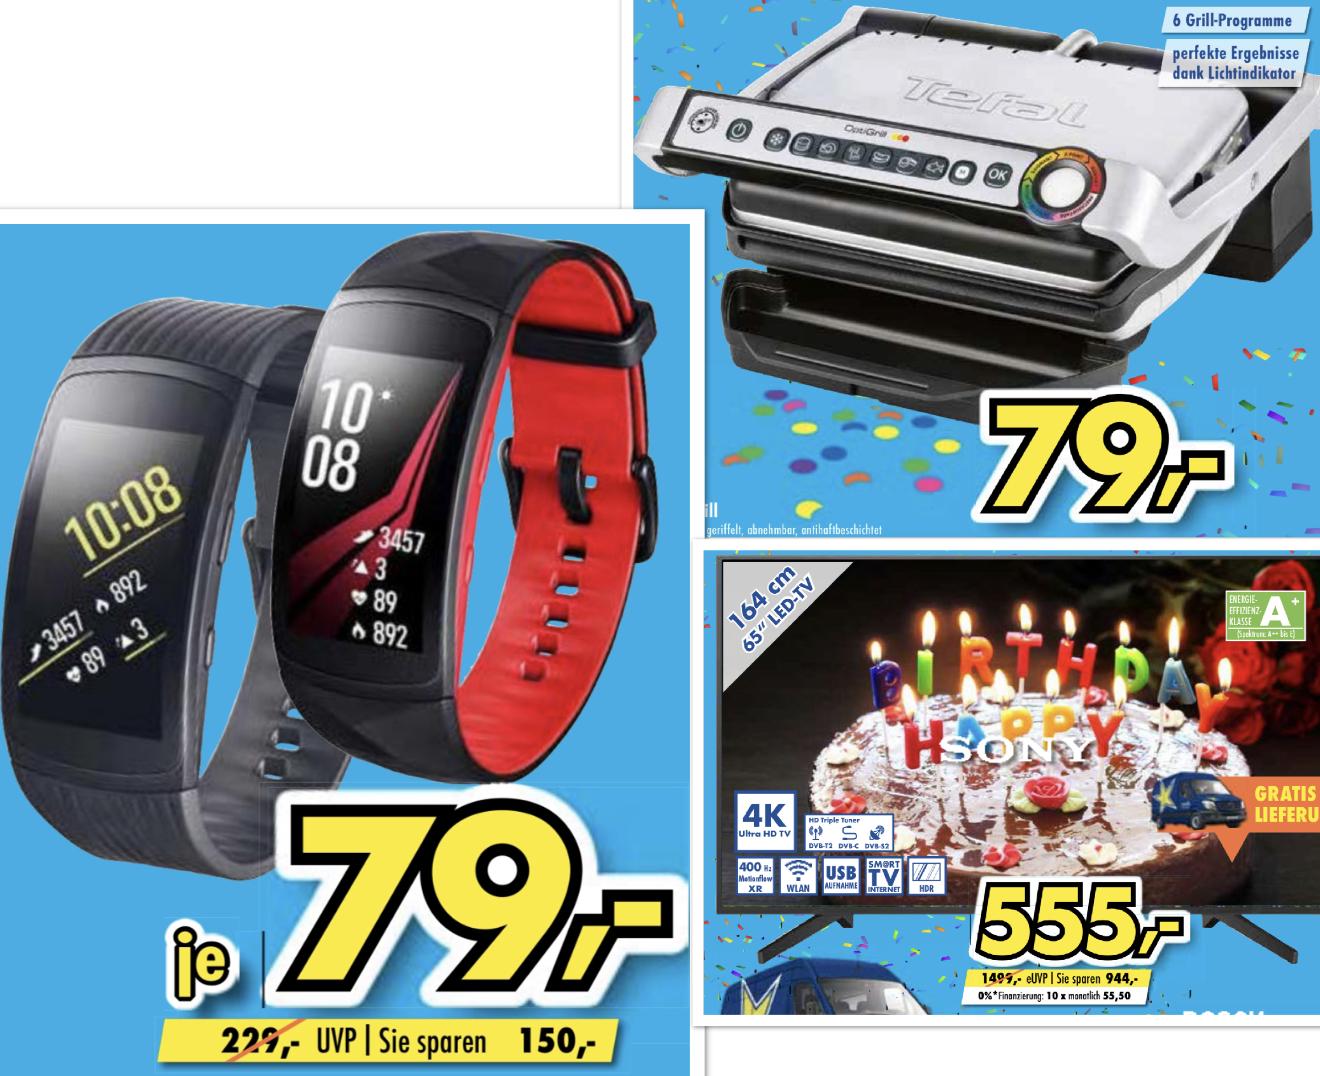 Lokal Euronics Brumberg: Samsung Gear Fit 2 Pro für 79€ / Tefal Optigrill GC702D für 79€ / Sony KD-65XF7096 164cm 4K UHD TV für 555€ usw.